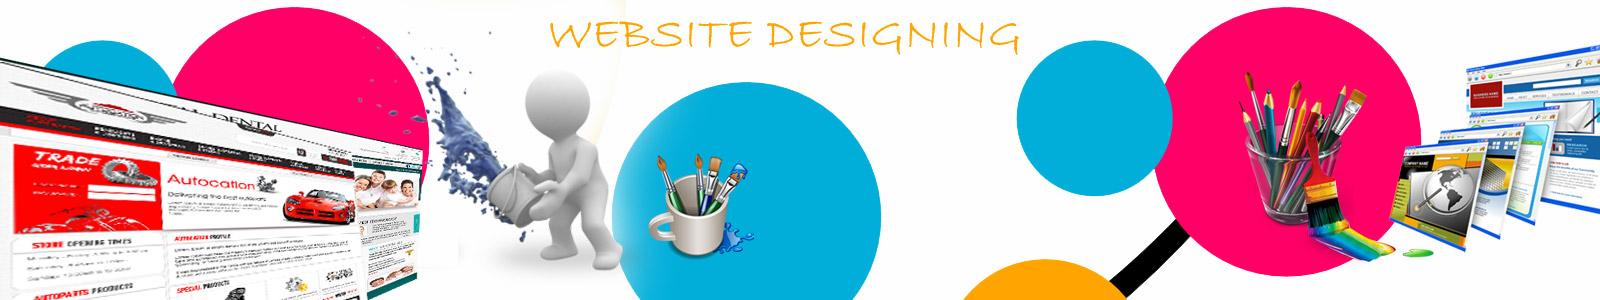 website_desiging